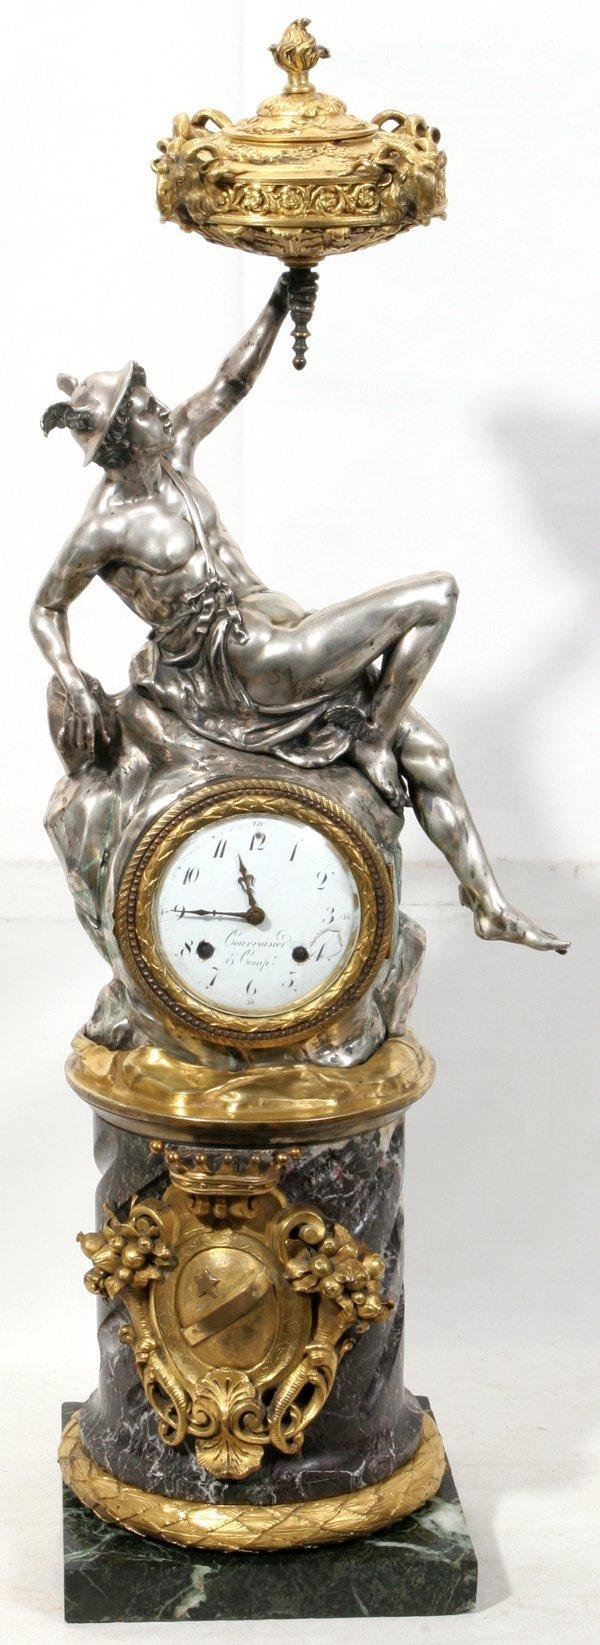 021007: COURVOISIER & COMP SILVER, BRONZE FIGURAL CLOCK